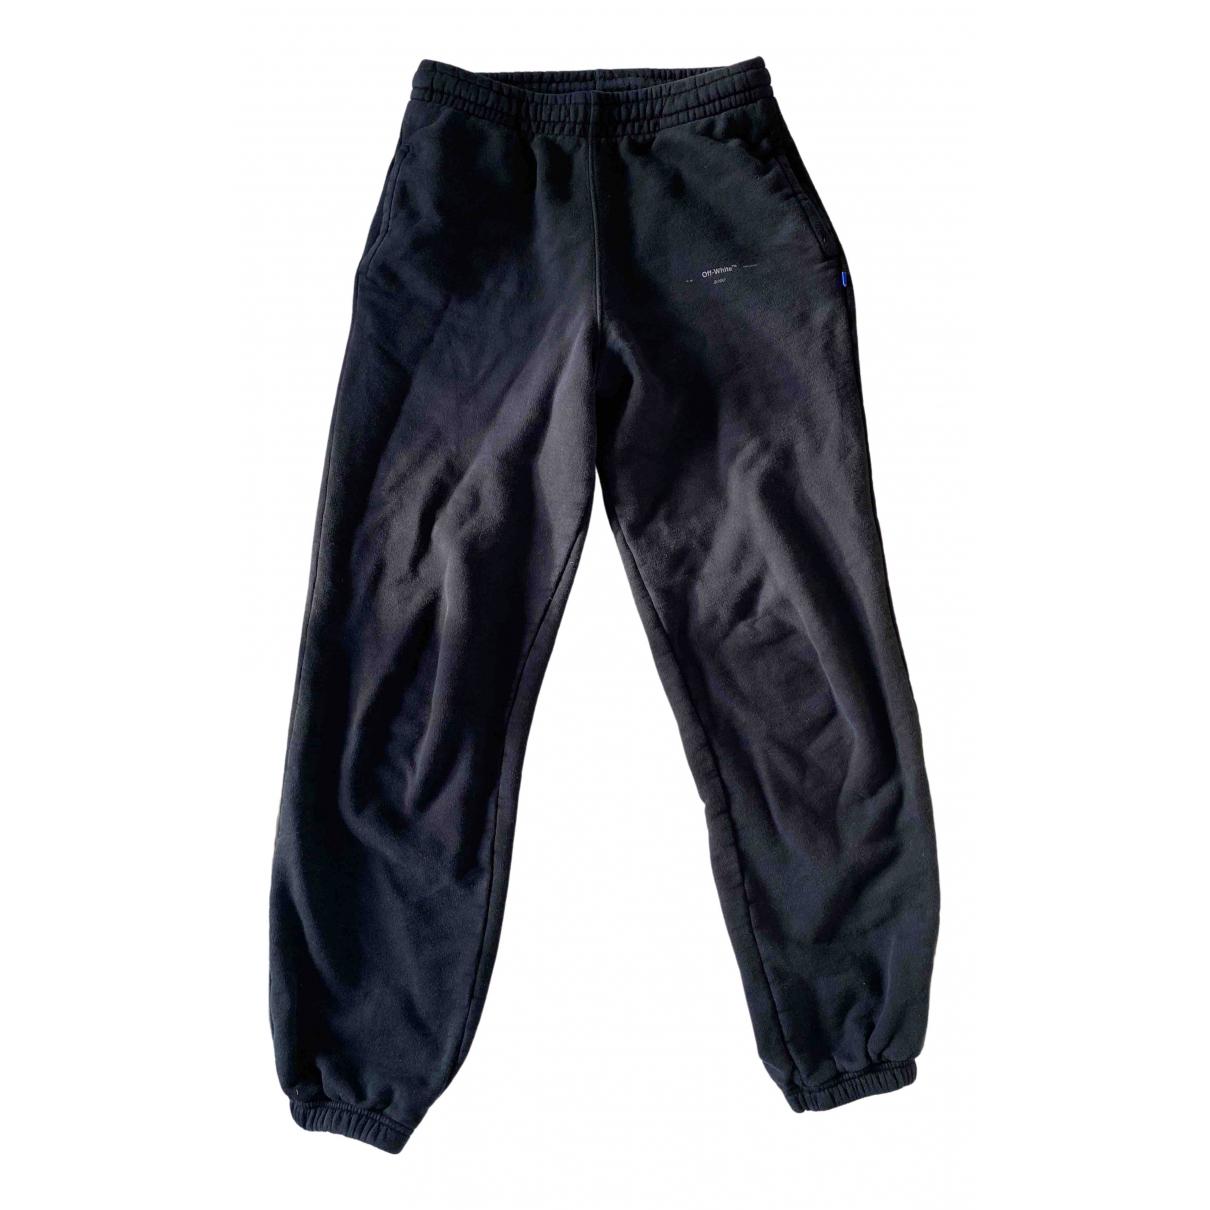 Pantalones en Algodon Negro Off-white